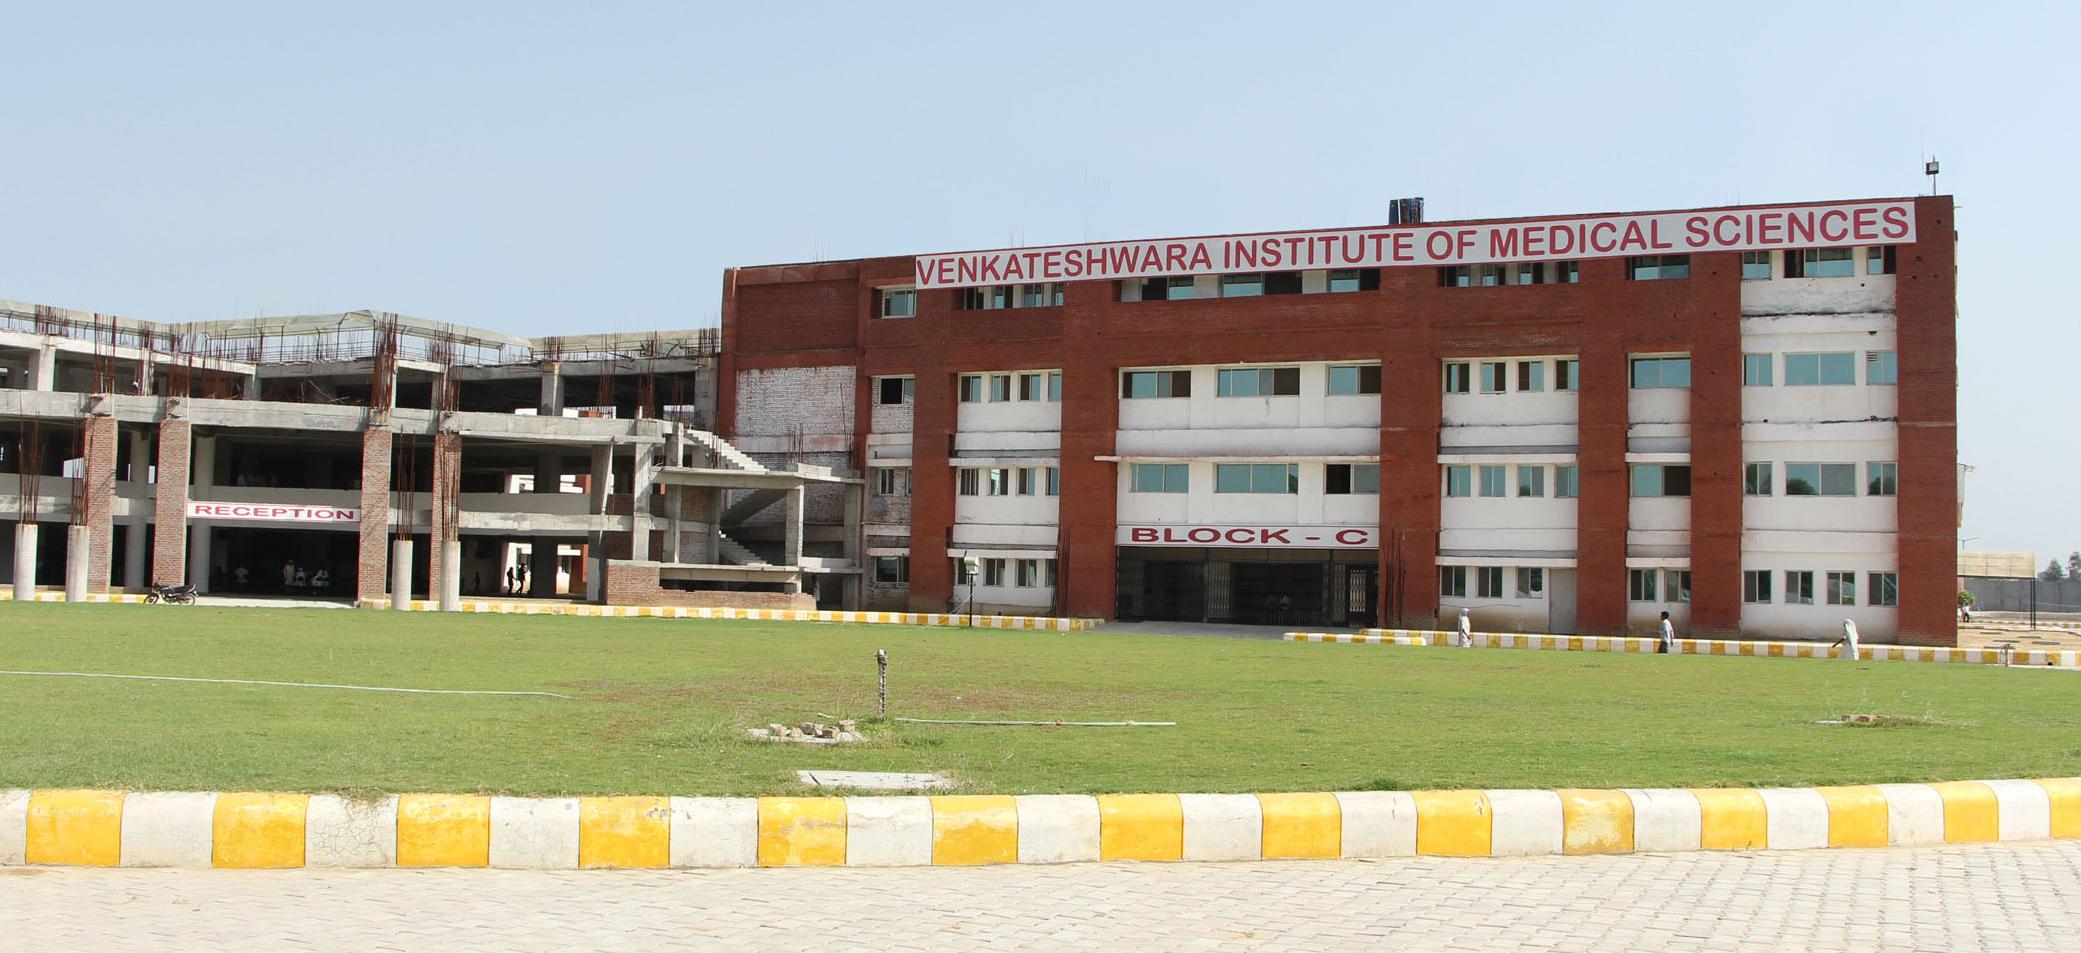 Venkateshwara Institute of Medical Sciences, Gajraula